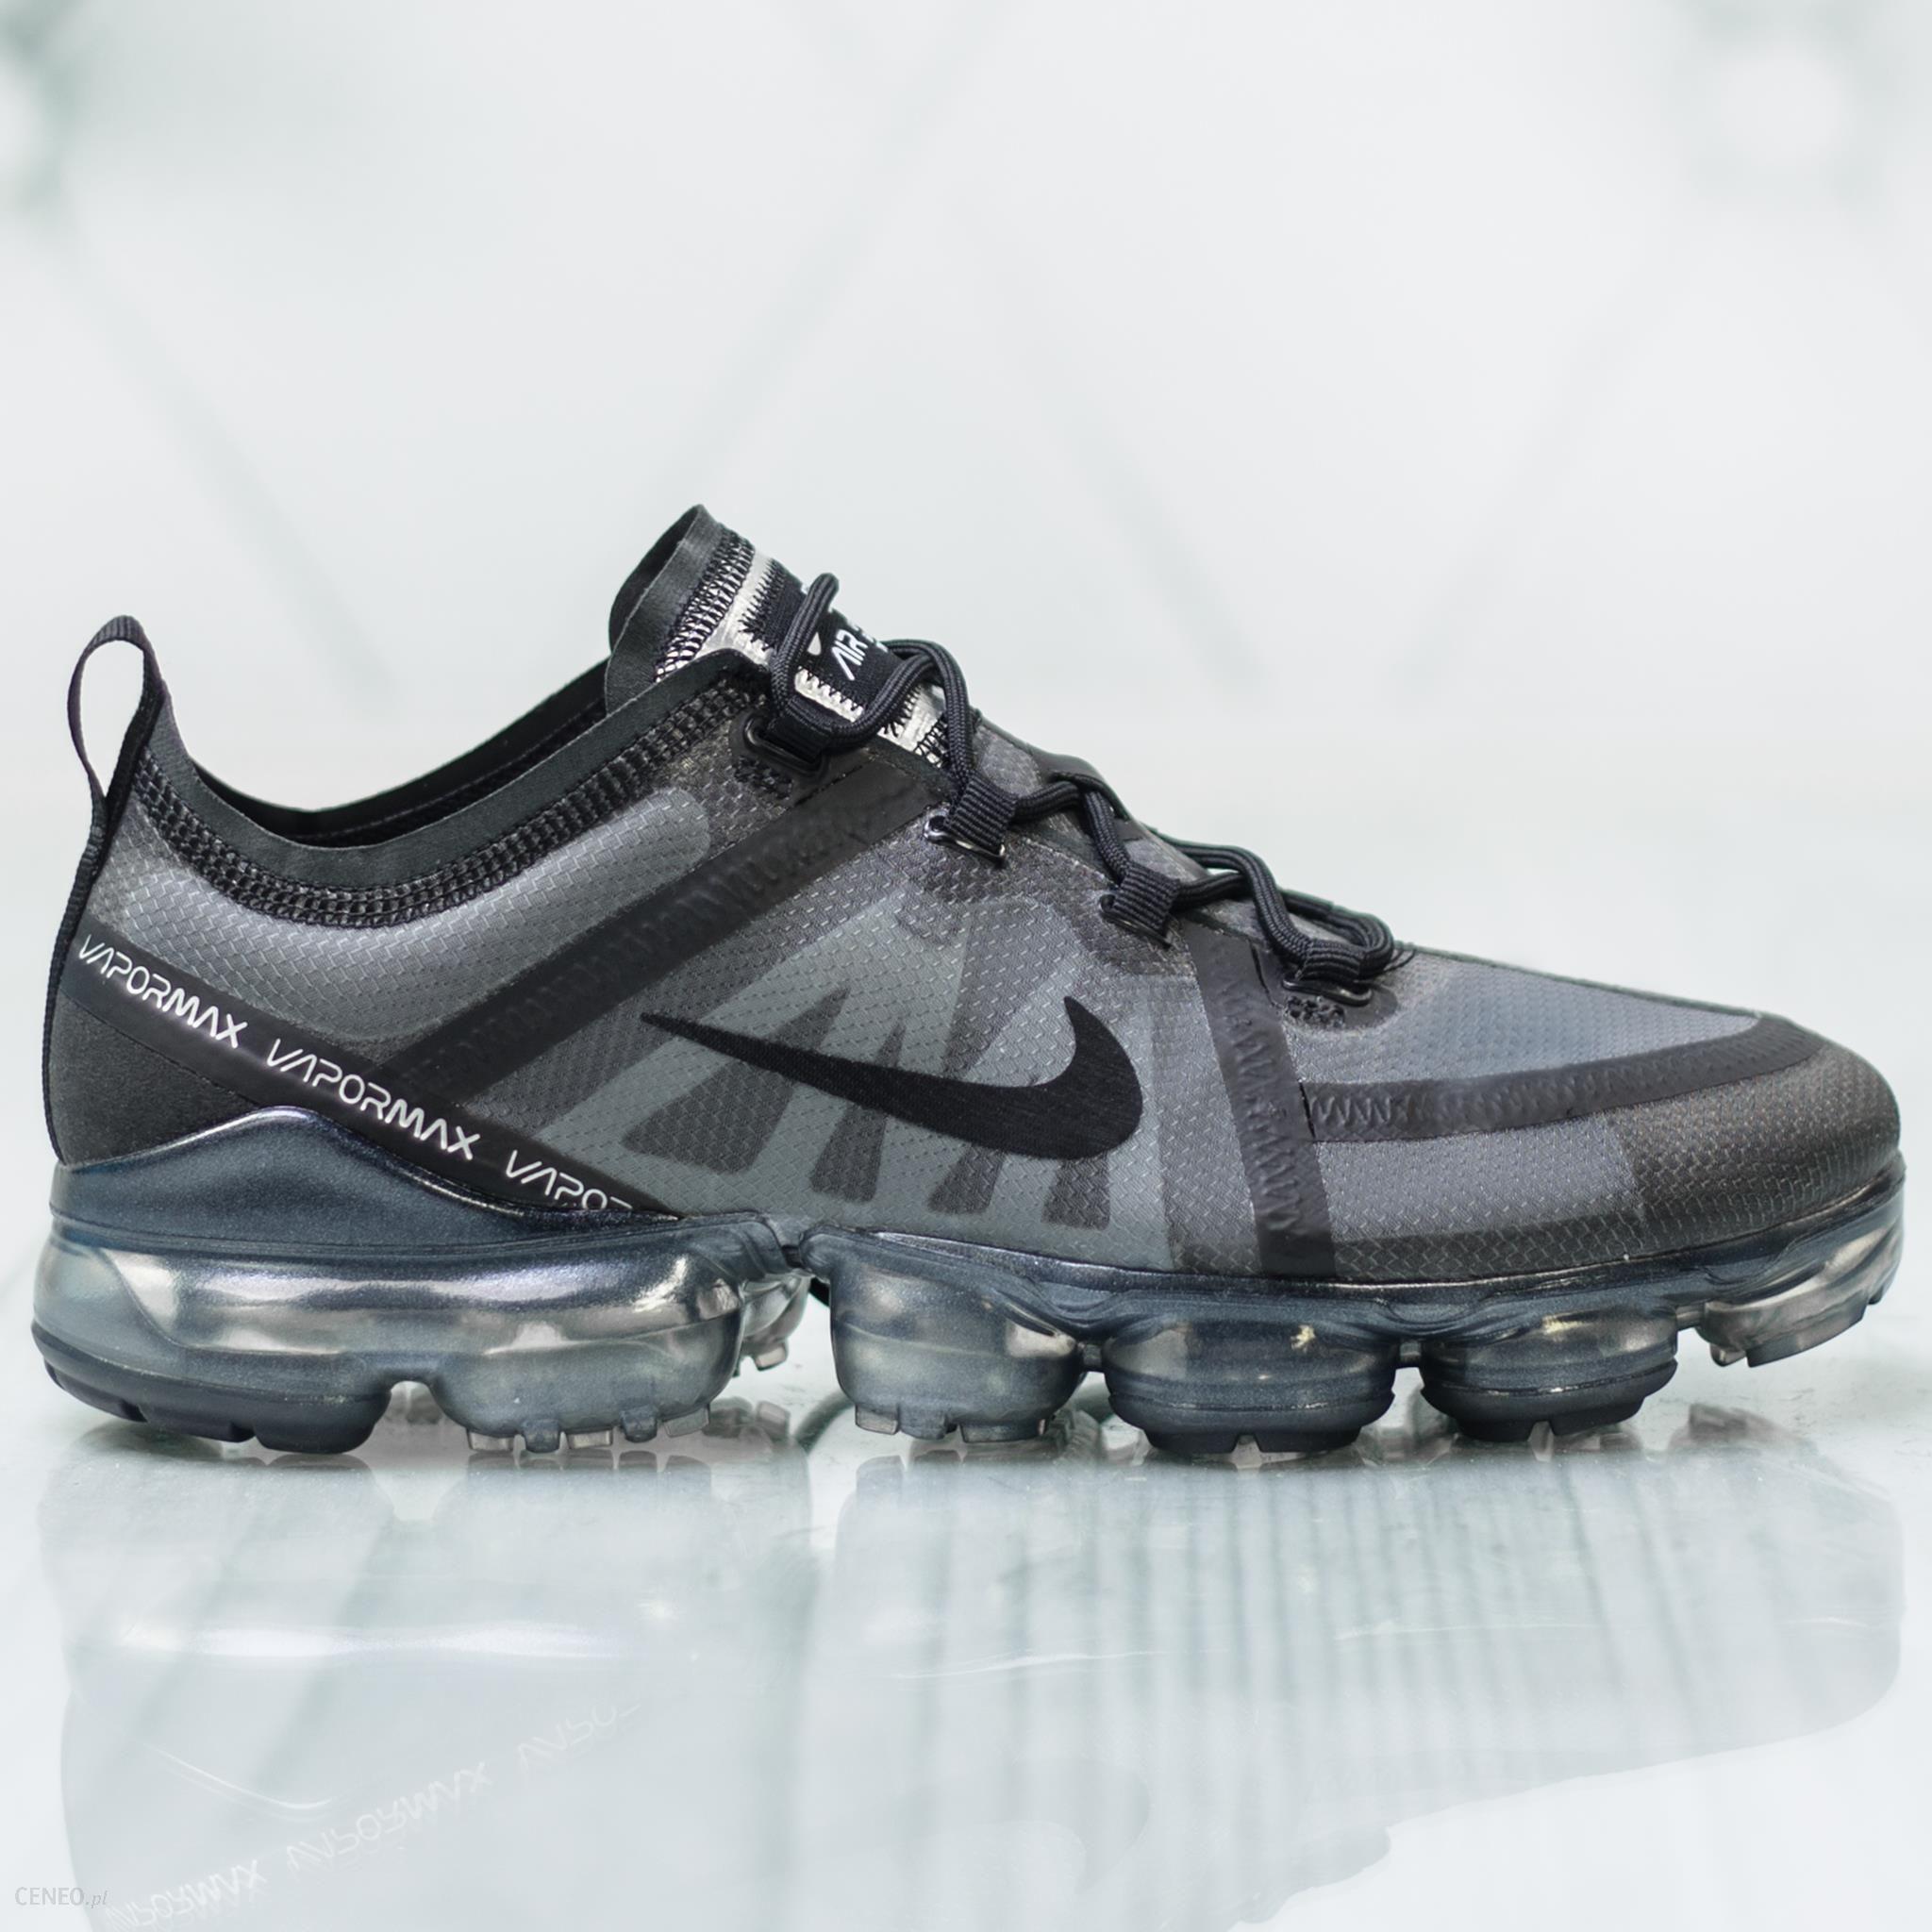 Buty do biegania Nike Air VaporMax 2019 AR6631 004 kup